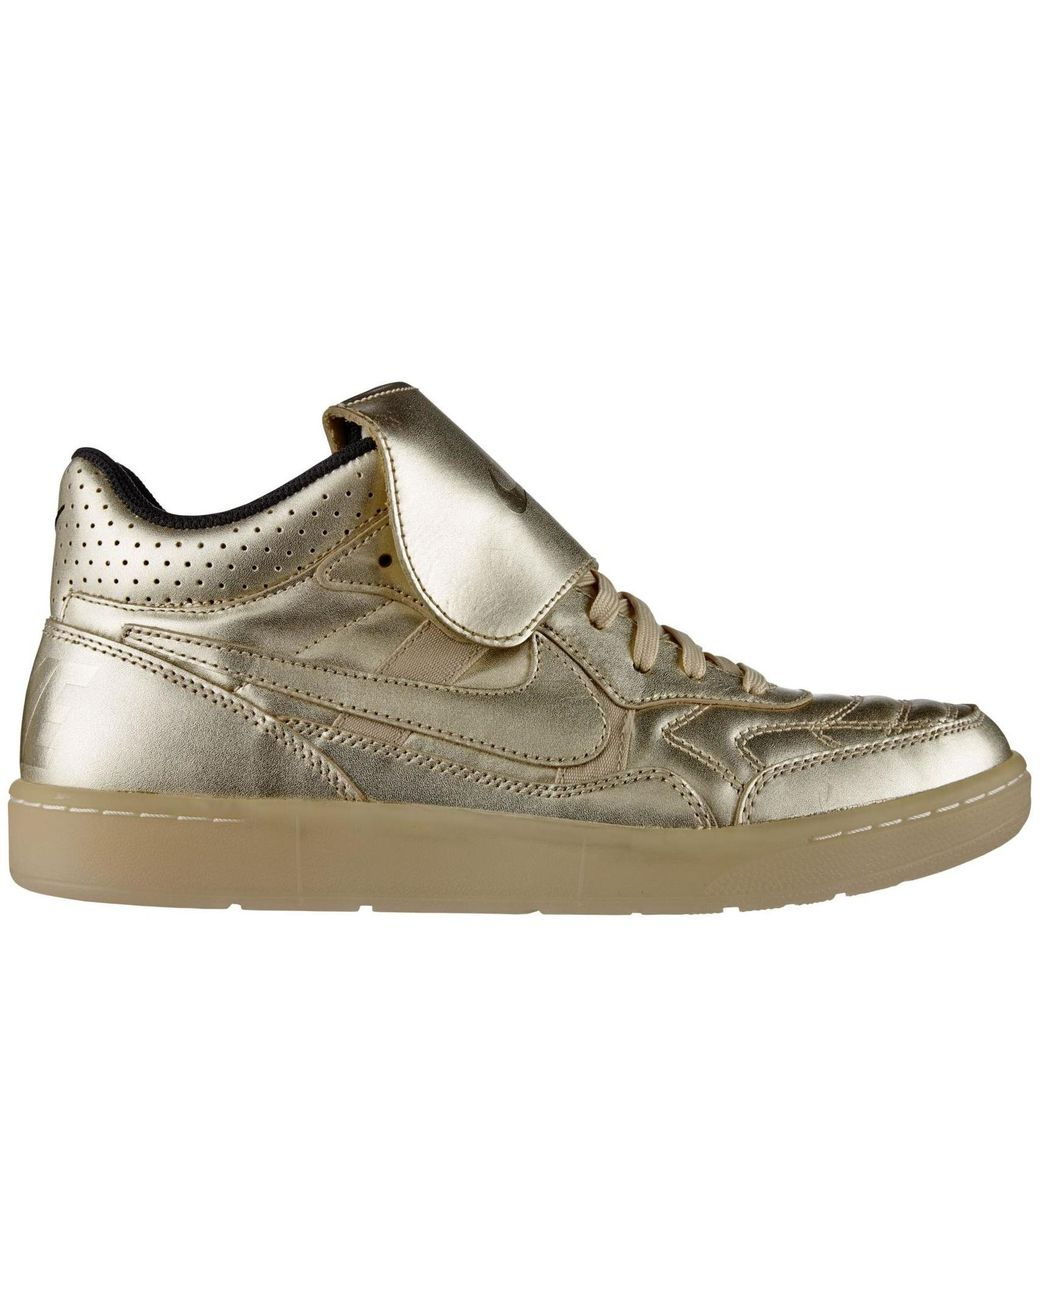 chaussures de sport 39b7d 693cd Men's Tiempo 94 Gold Hypervenom